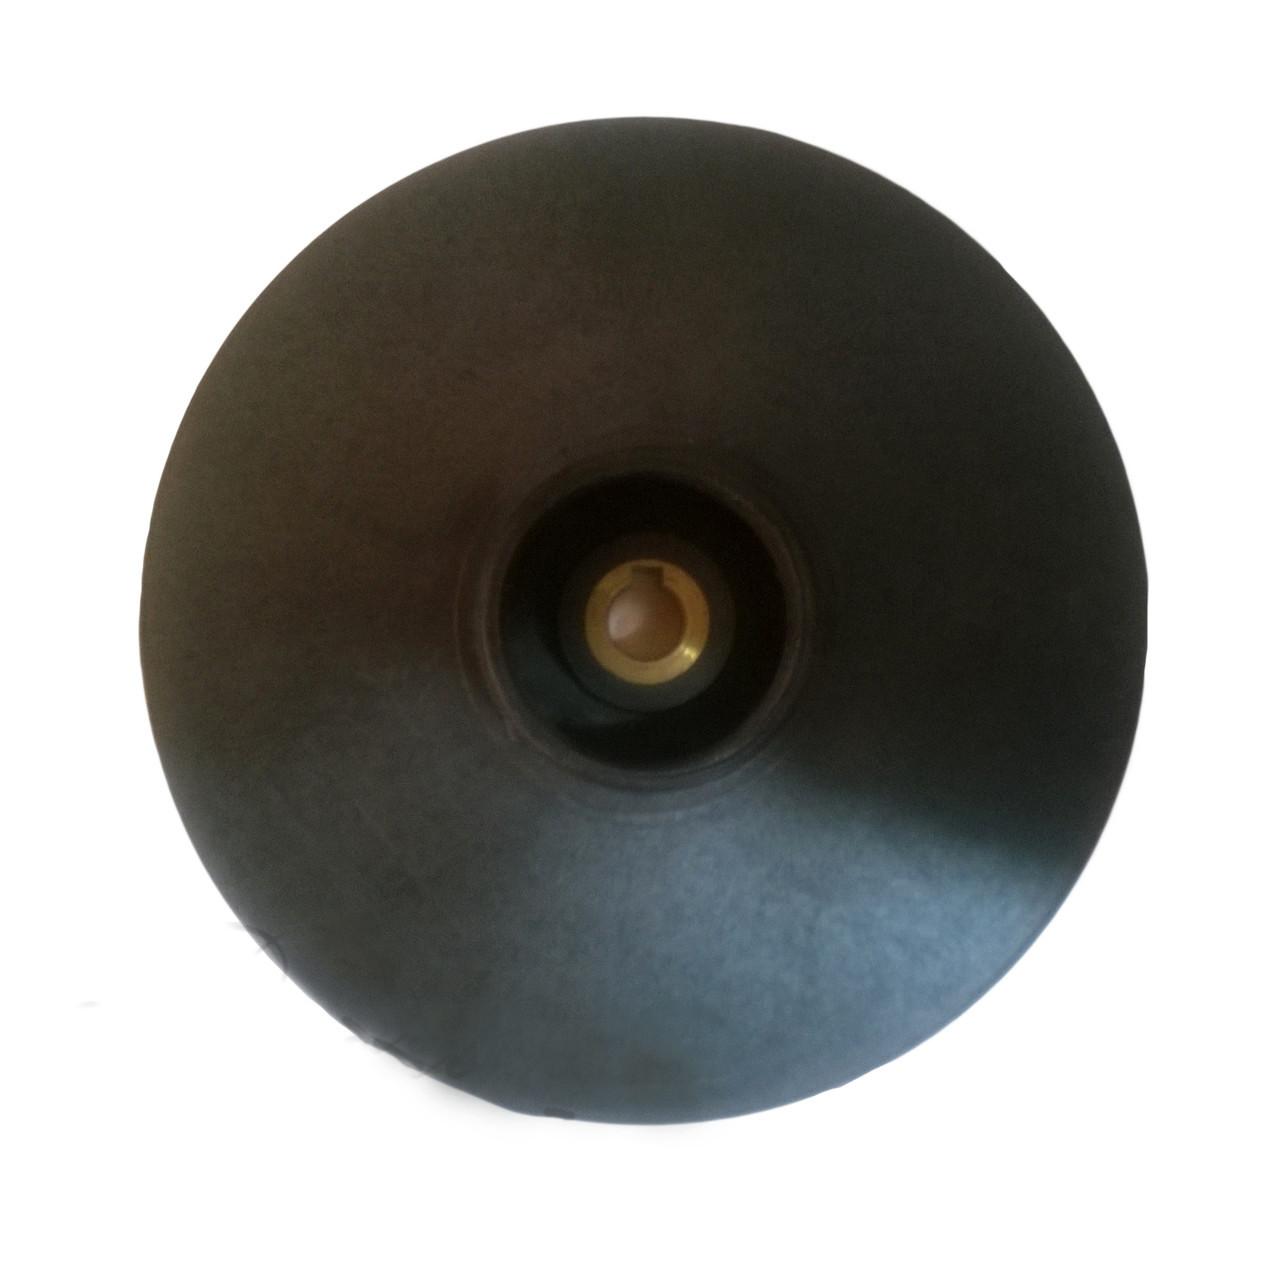 Рабочее колесо к насосу JET150S пластик(130/6/40.5mm)